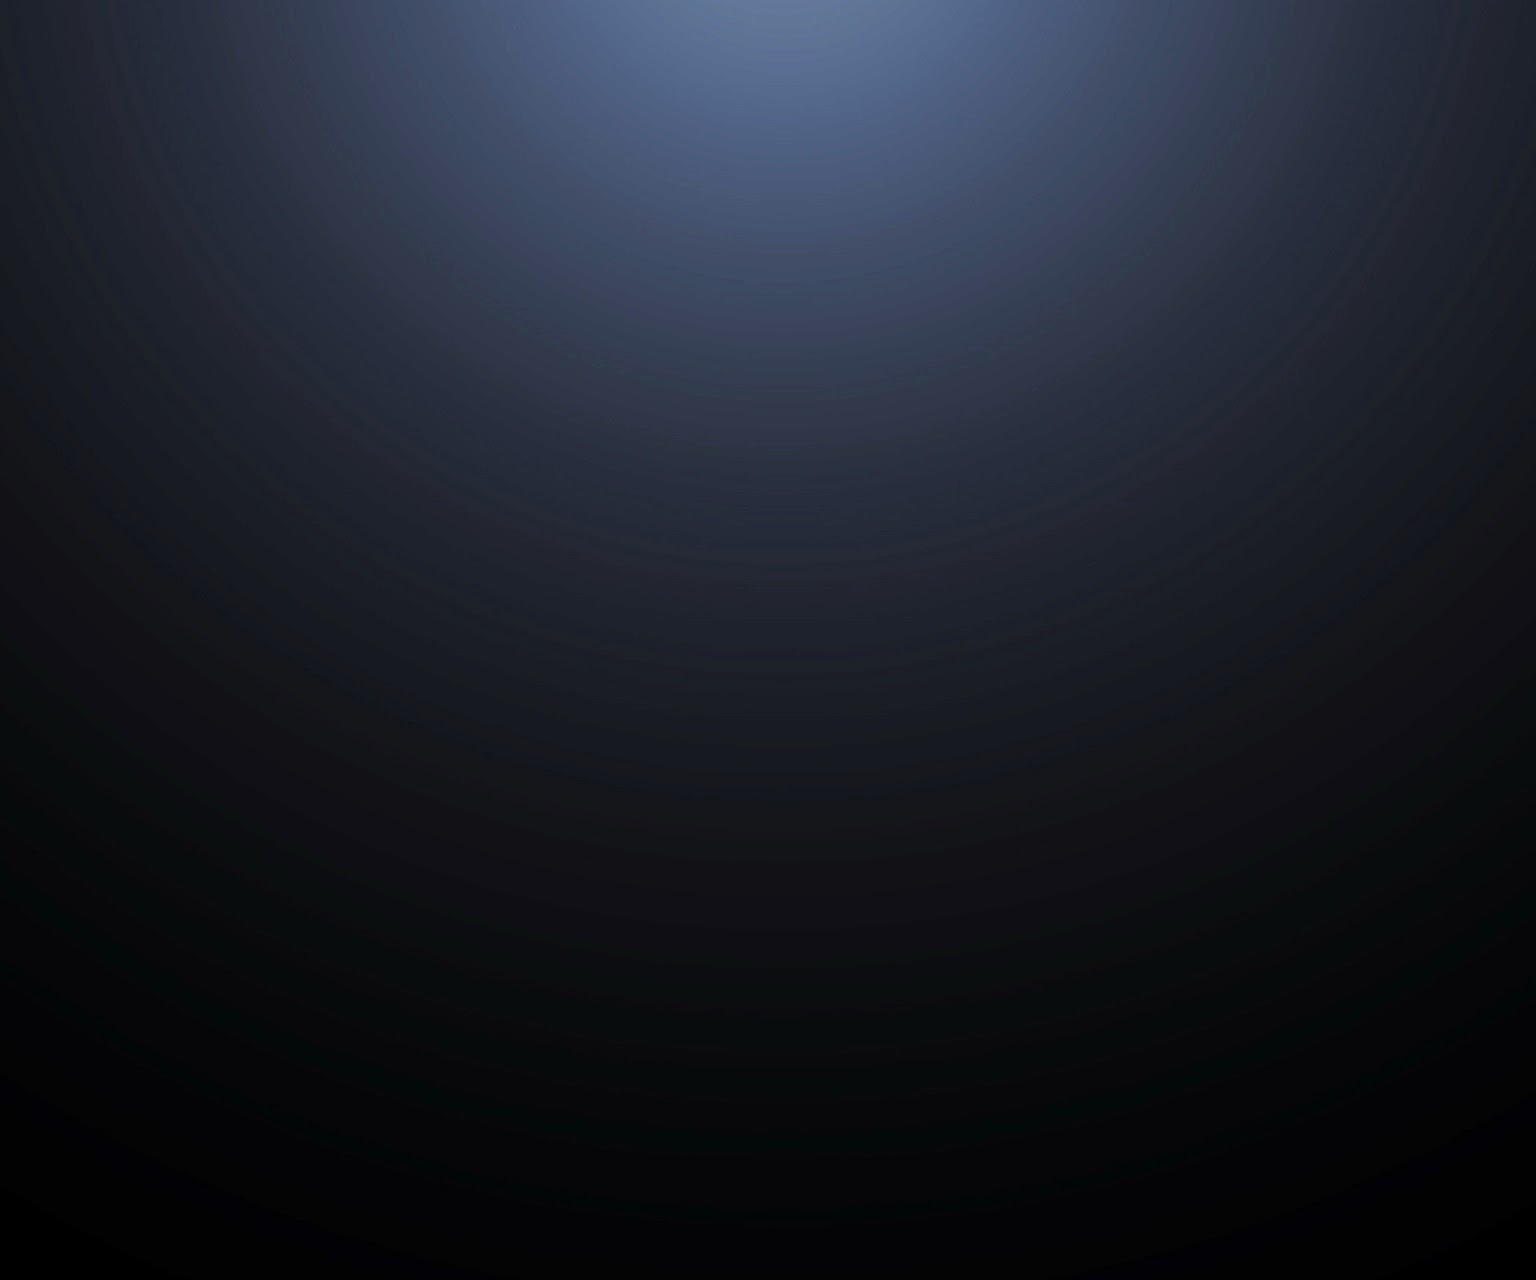 Simple BlackBerry Z10 1536x1280 Backgrounds 2014